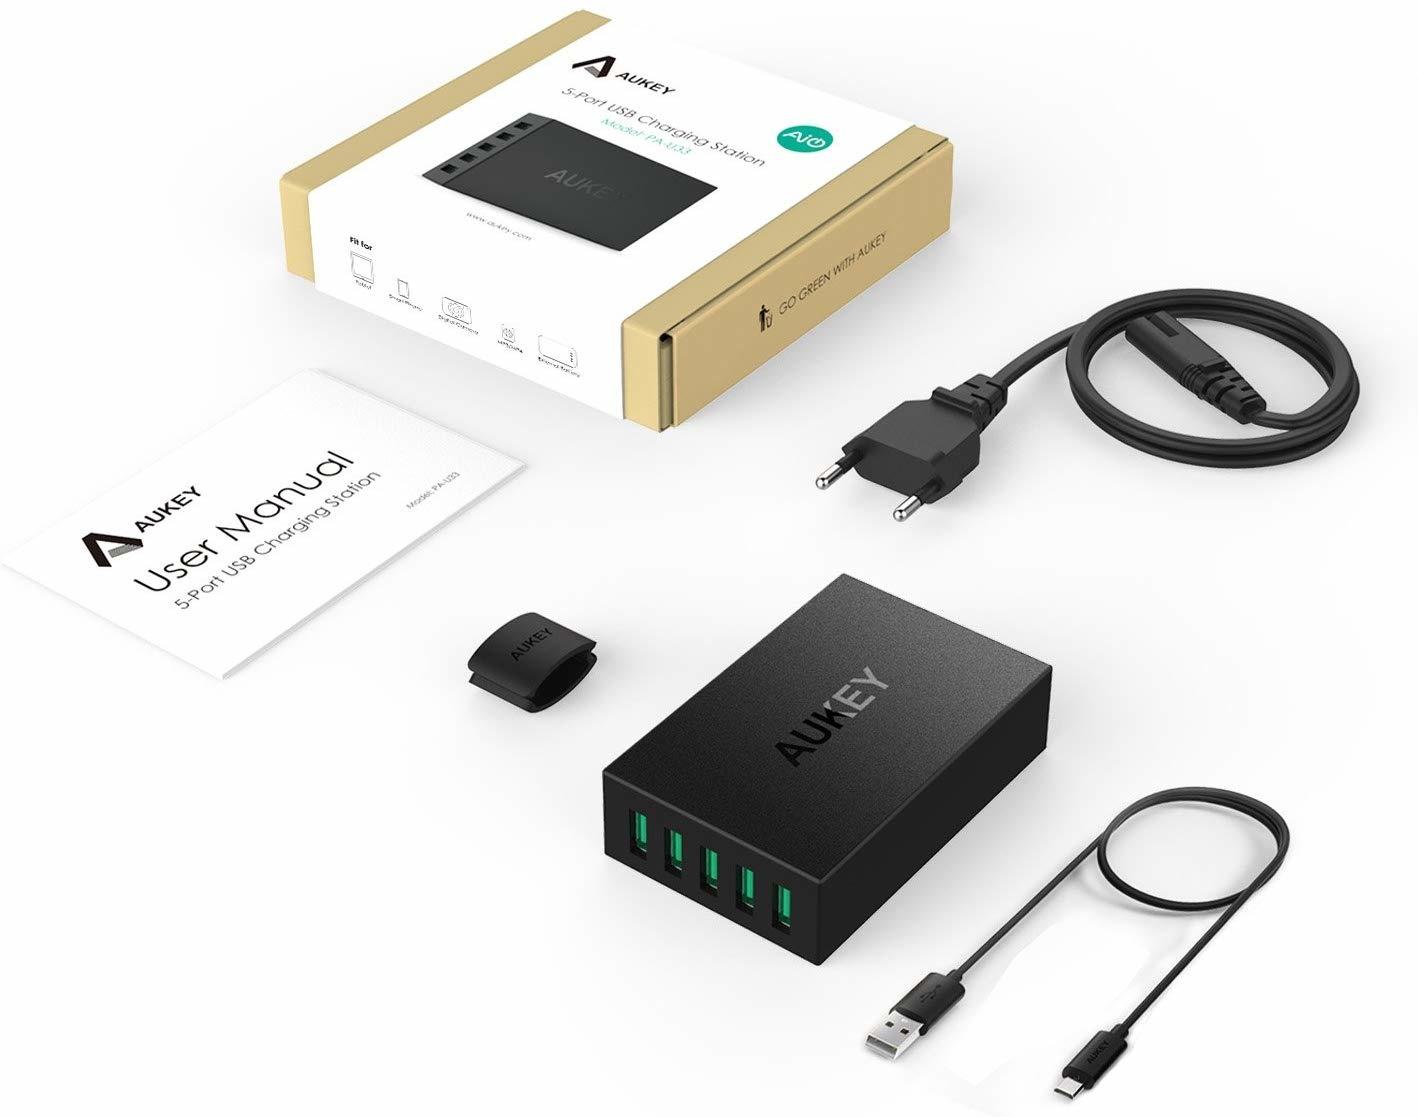 Aukey PA-U33 5-poorts 50W 10A USB-oplader voor iPhone / Android-smartphone / tablet / Bluetooth-luidspreker enz. zwart